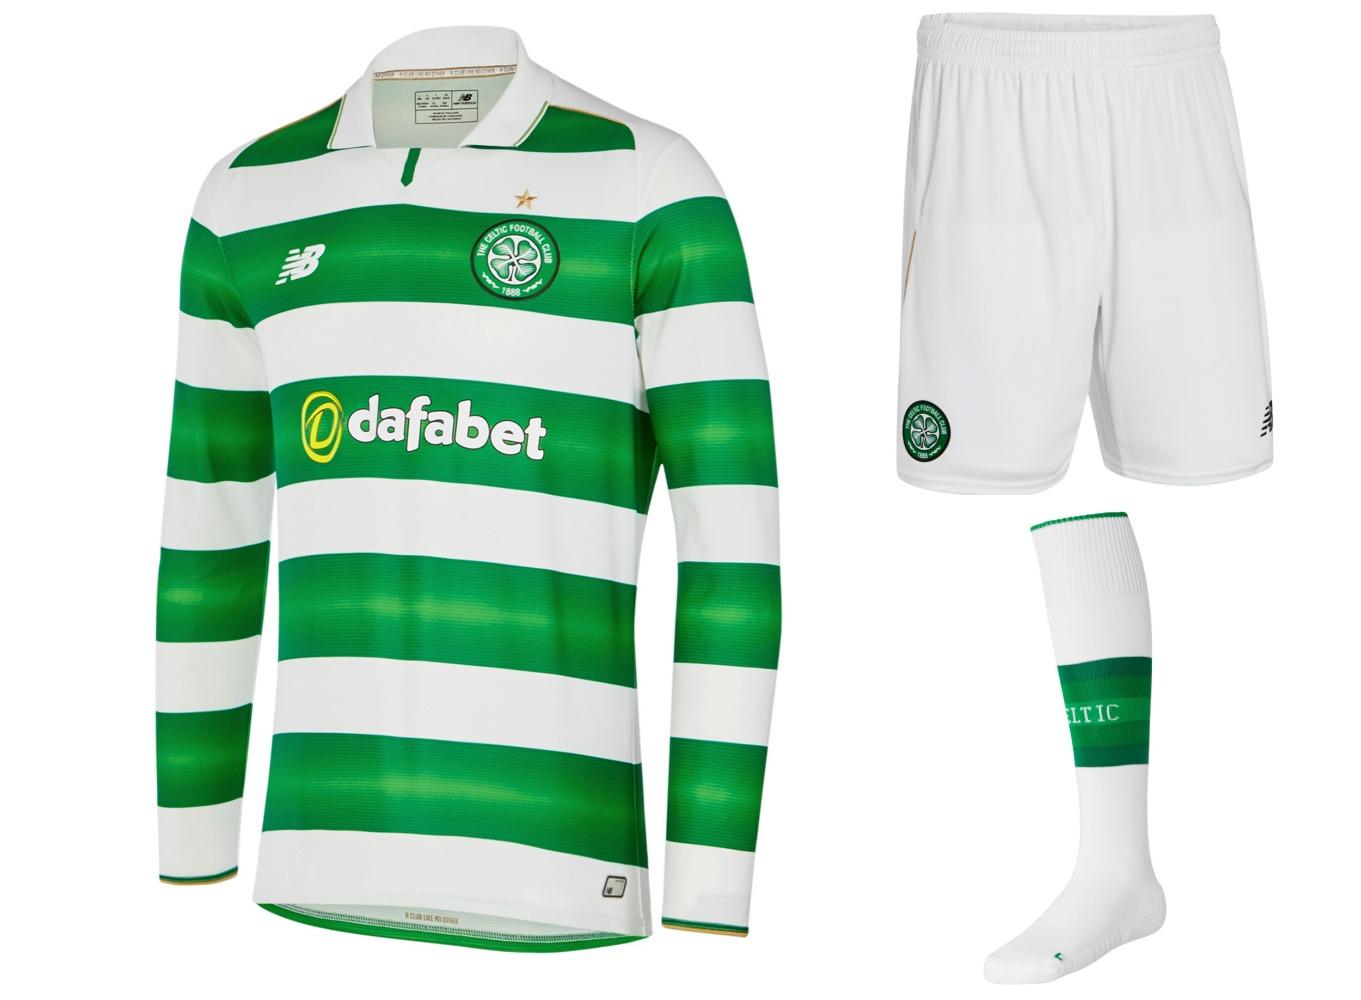 Celtic FC 2016/17 New Balance Home Kit – FOOTBALL FASHION.ORG